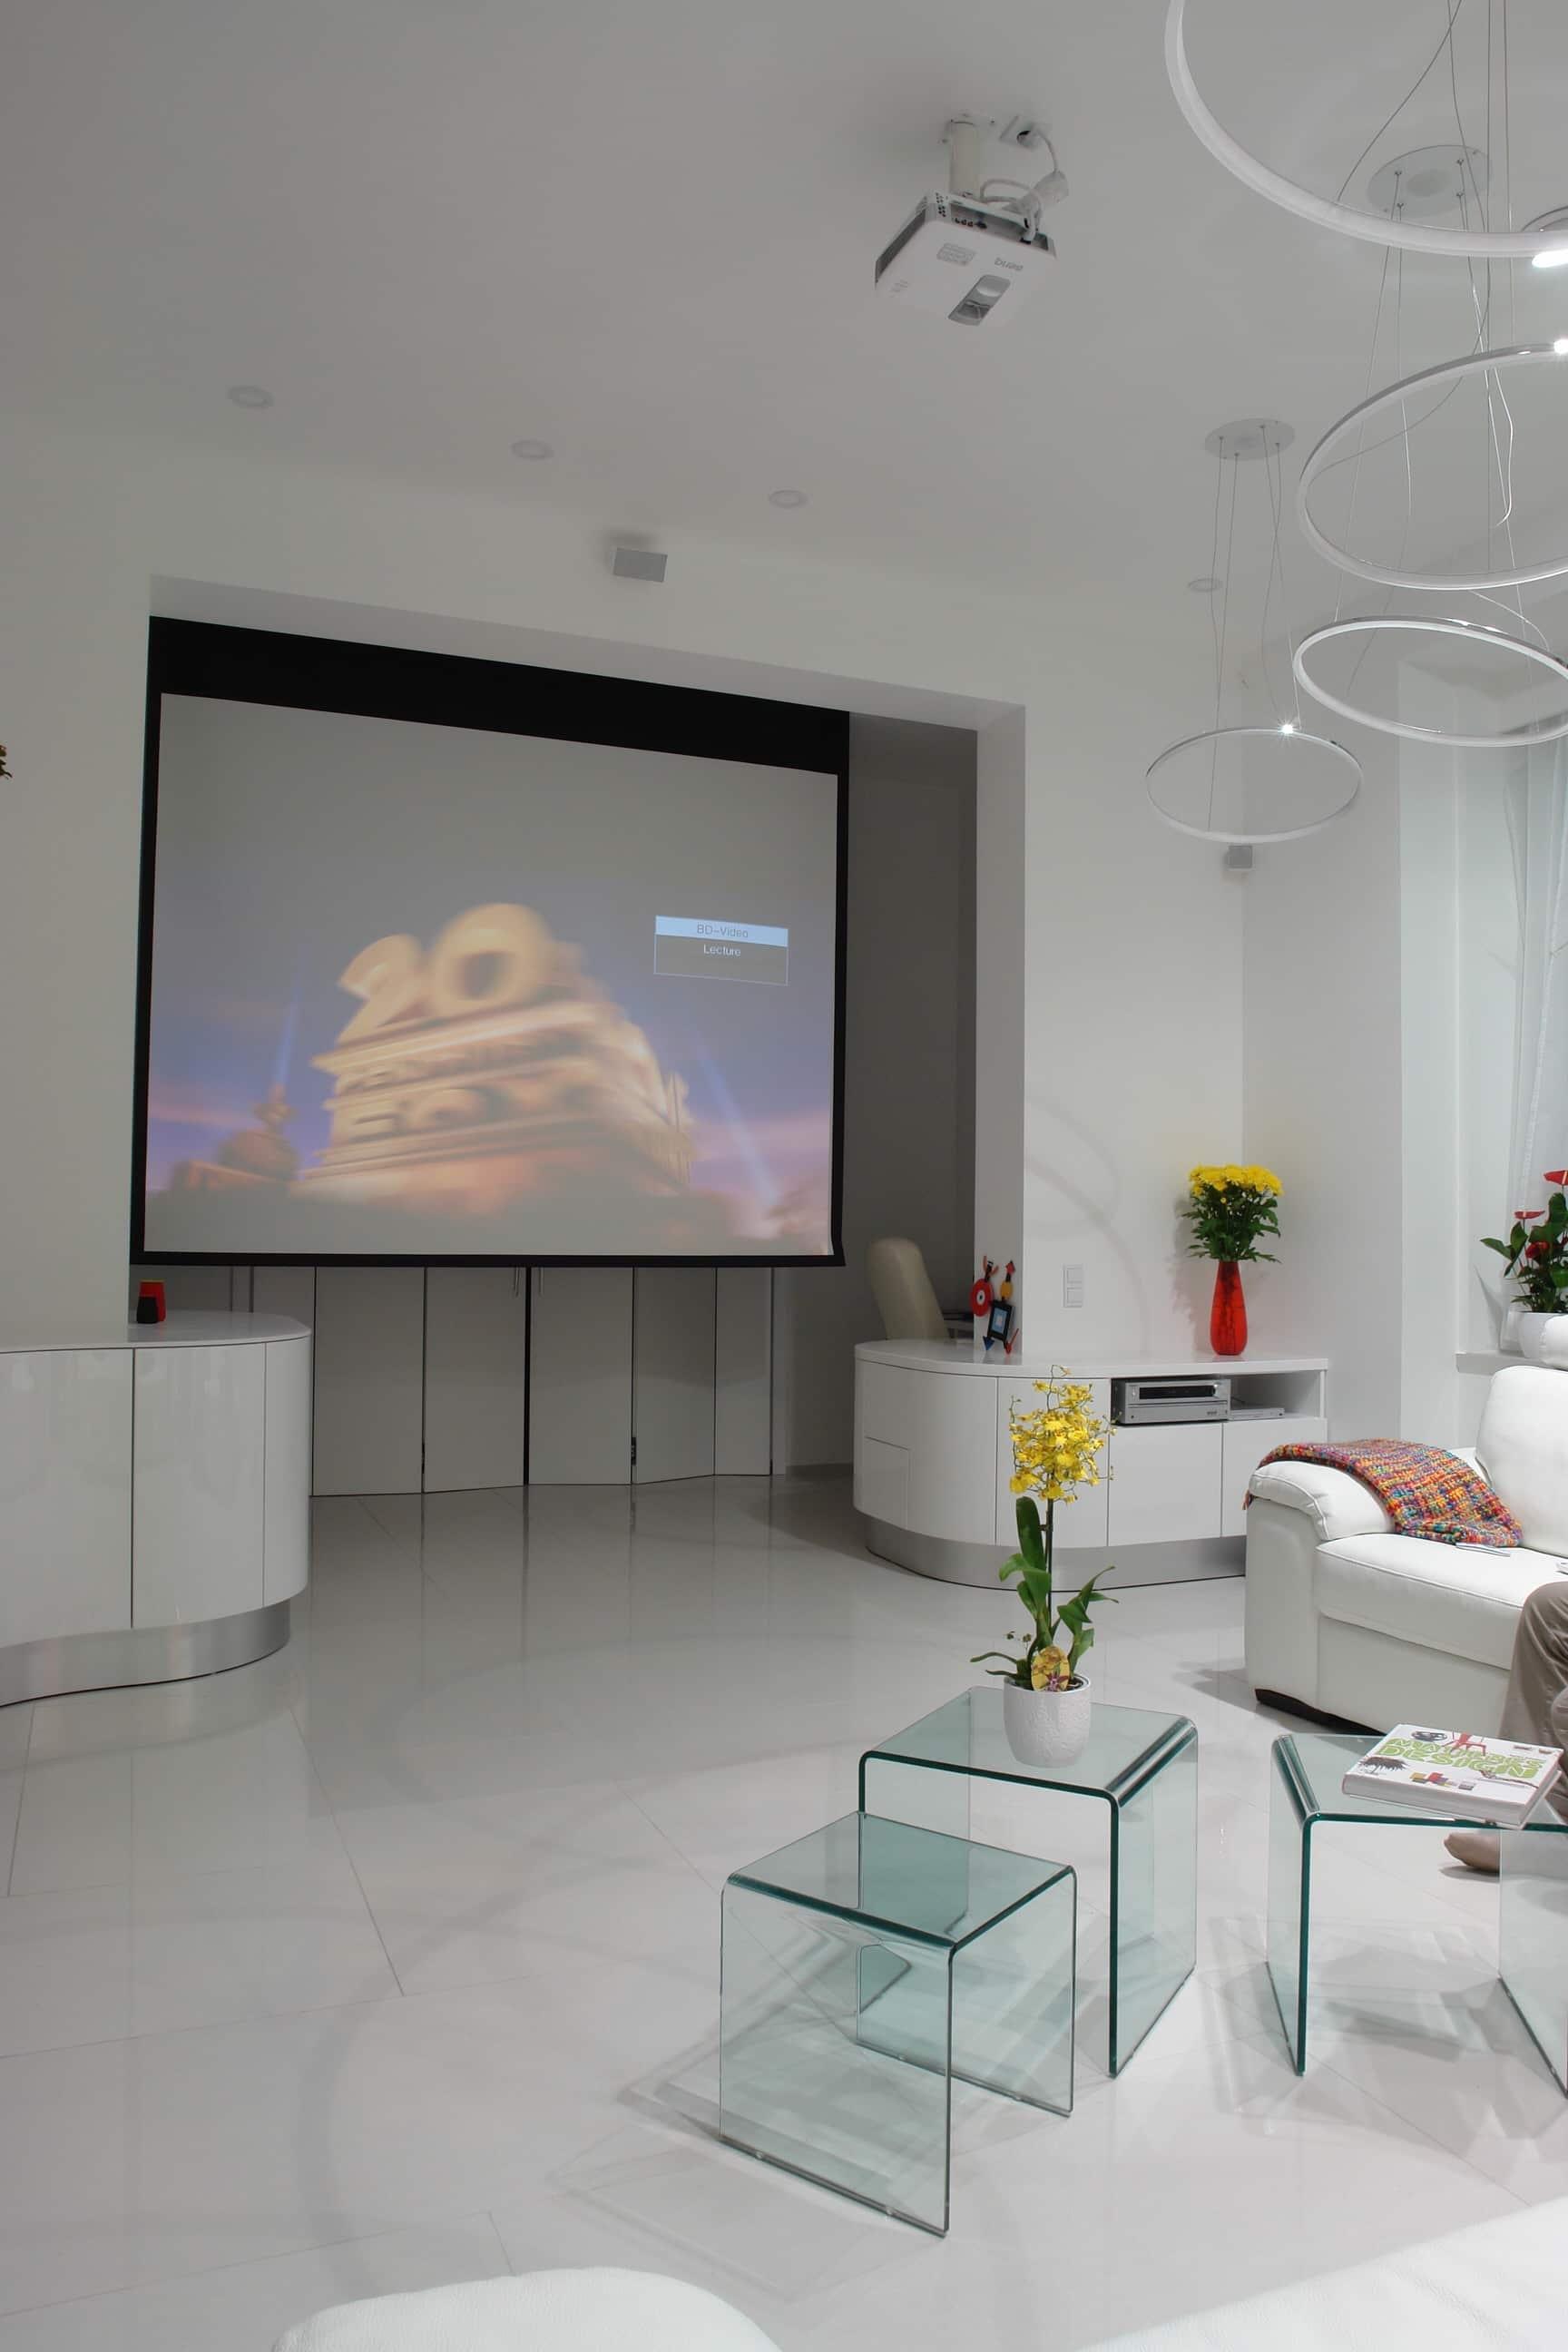 halasz-utca-modern-design-apartment-budapest-dsc06428